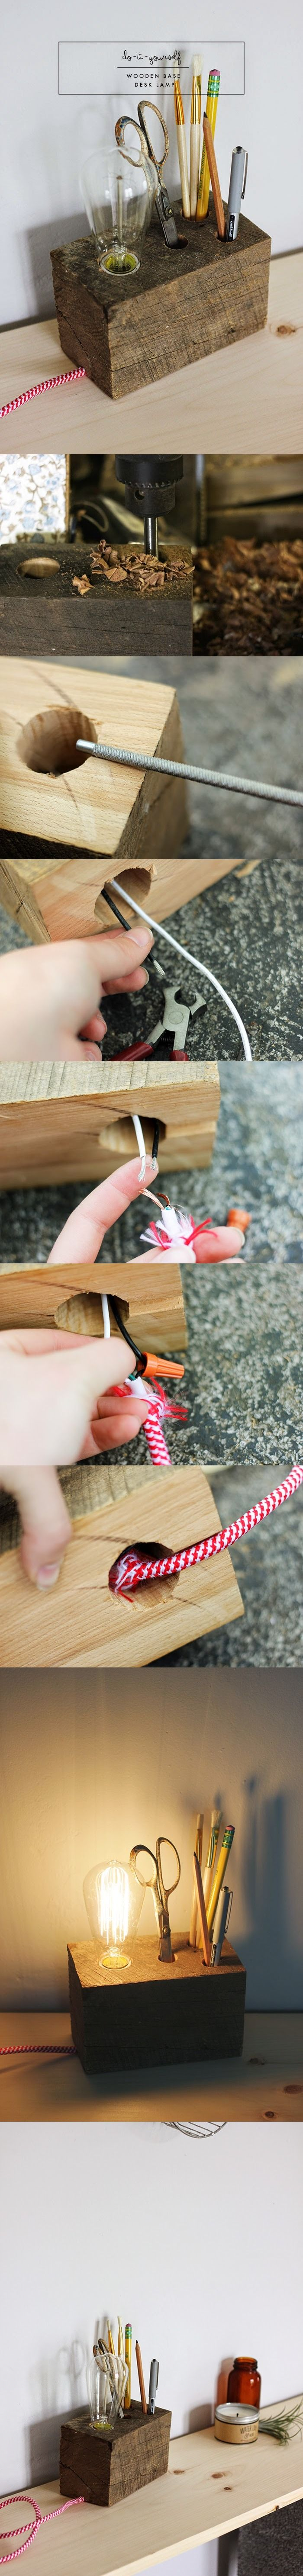 Creativo porta-lápices/ lámpara de madera para escritorio - Muy Ingenioso